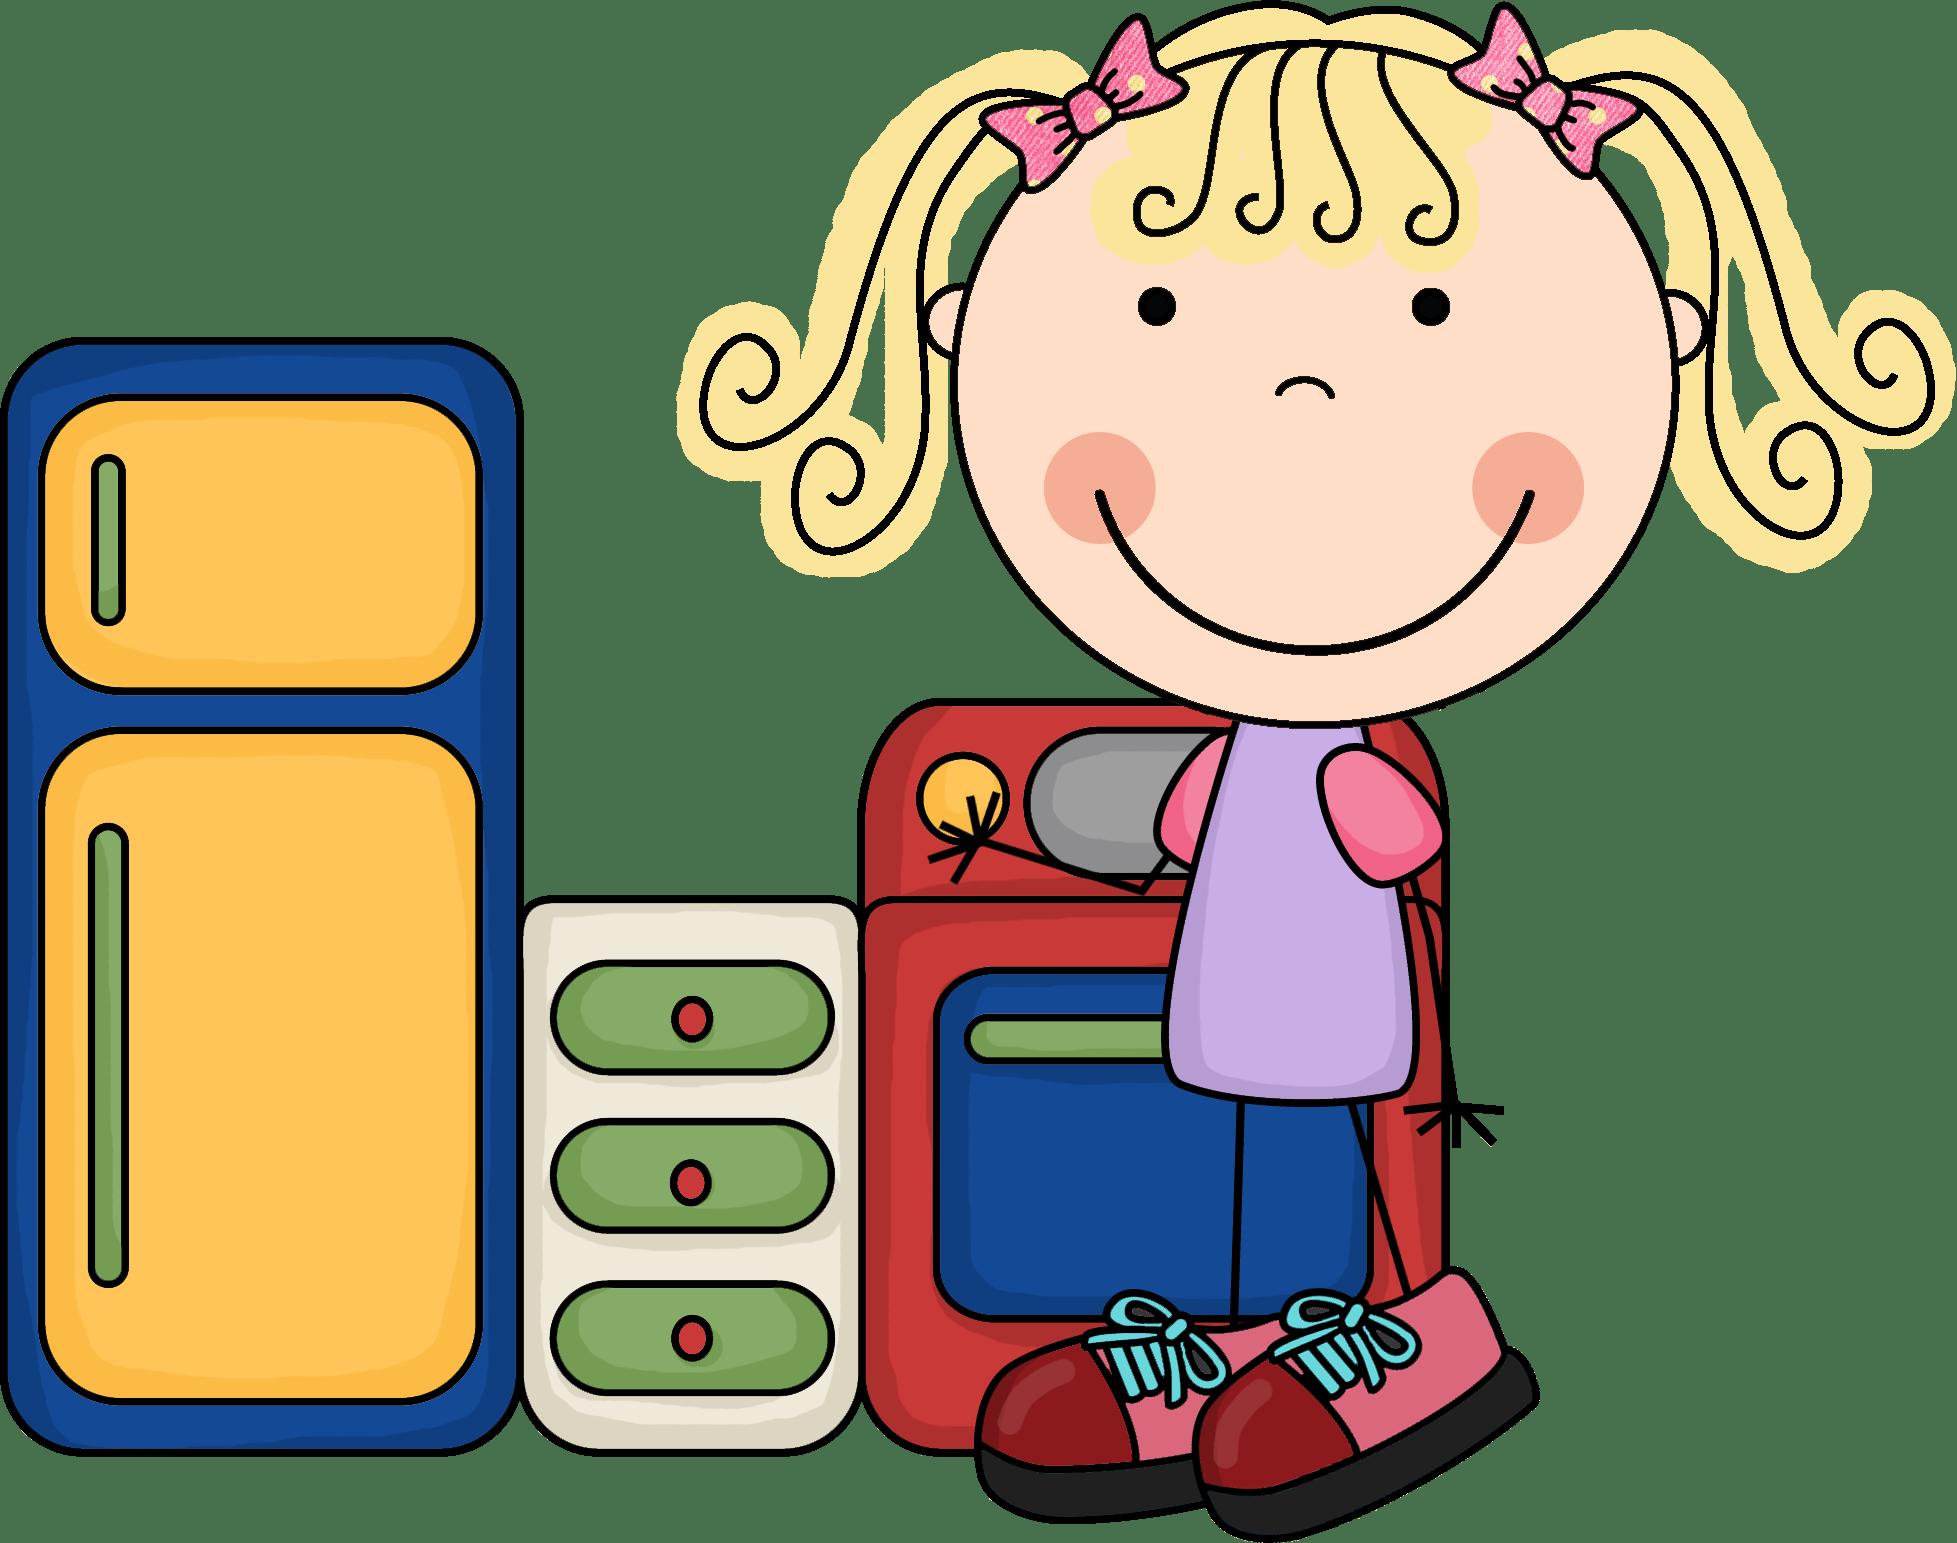 Preschool center time clipart 4 » Clipart Portal.